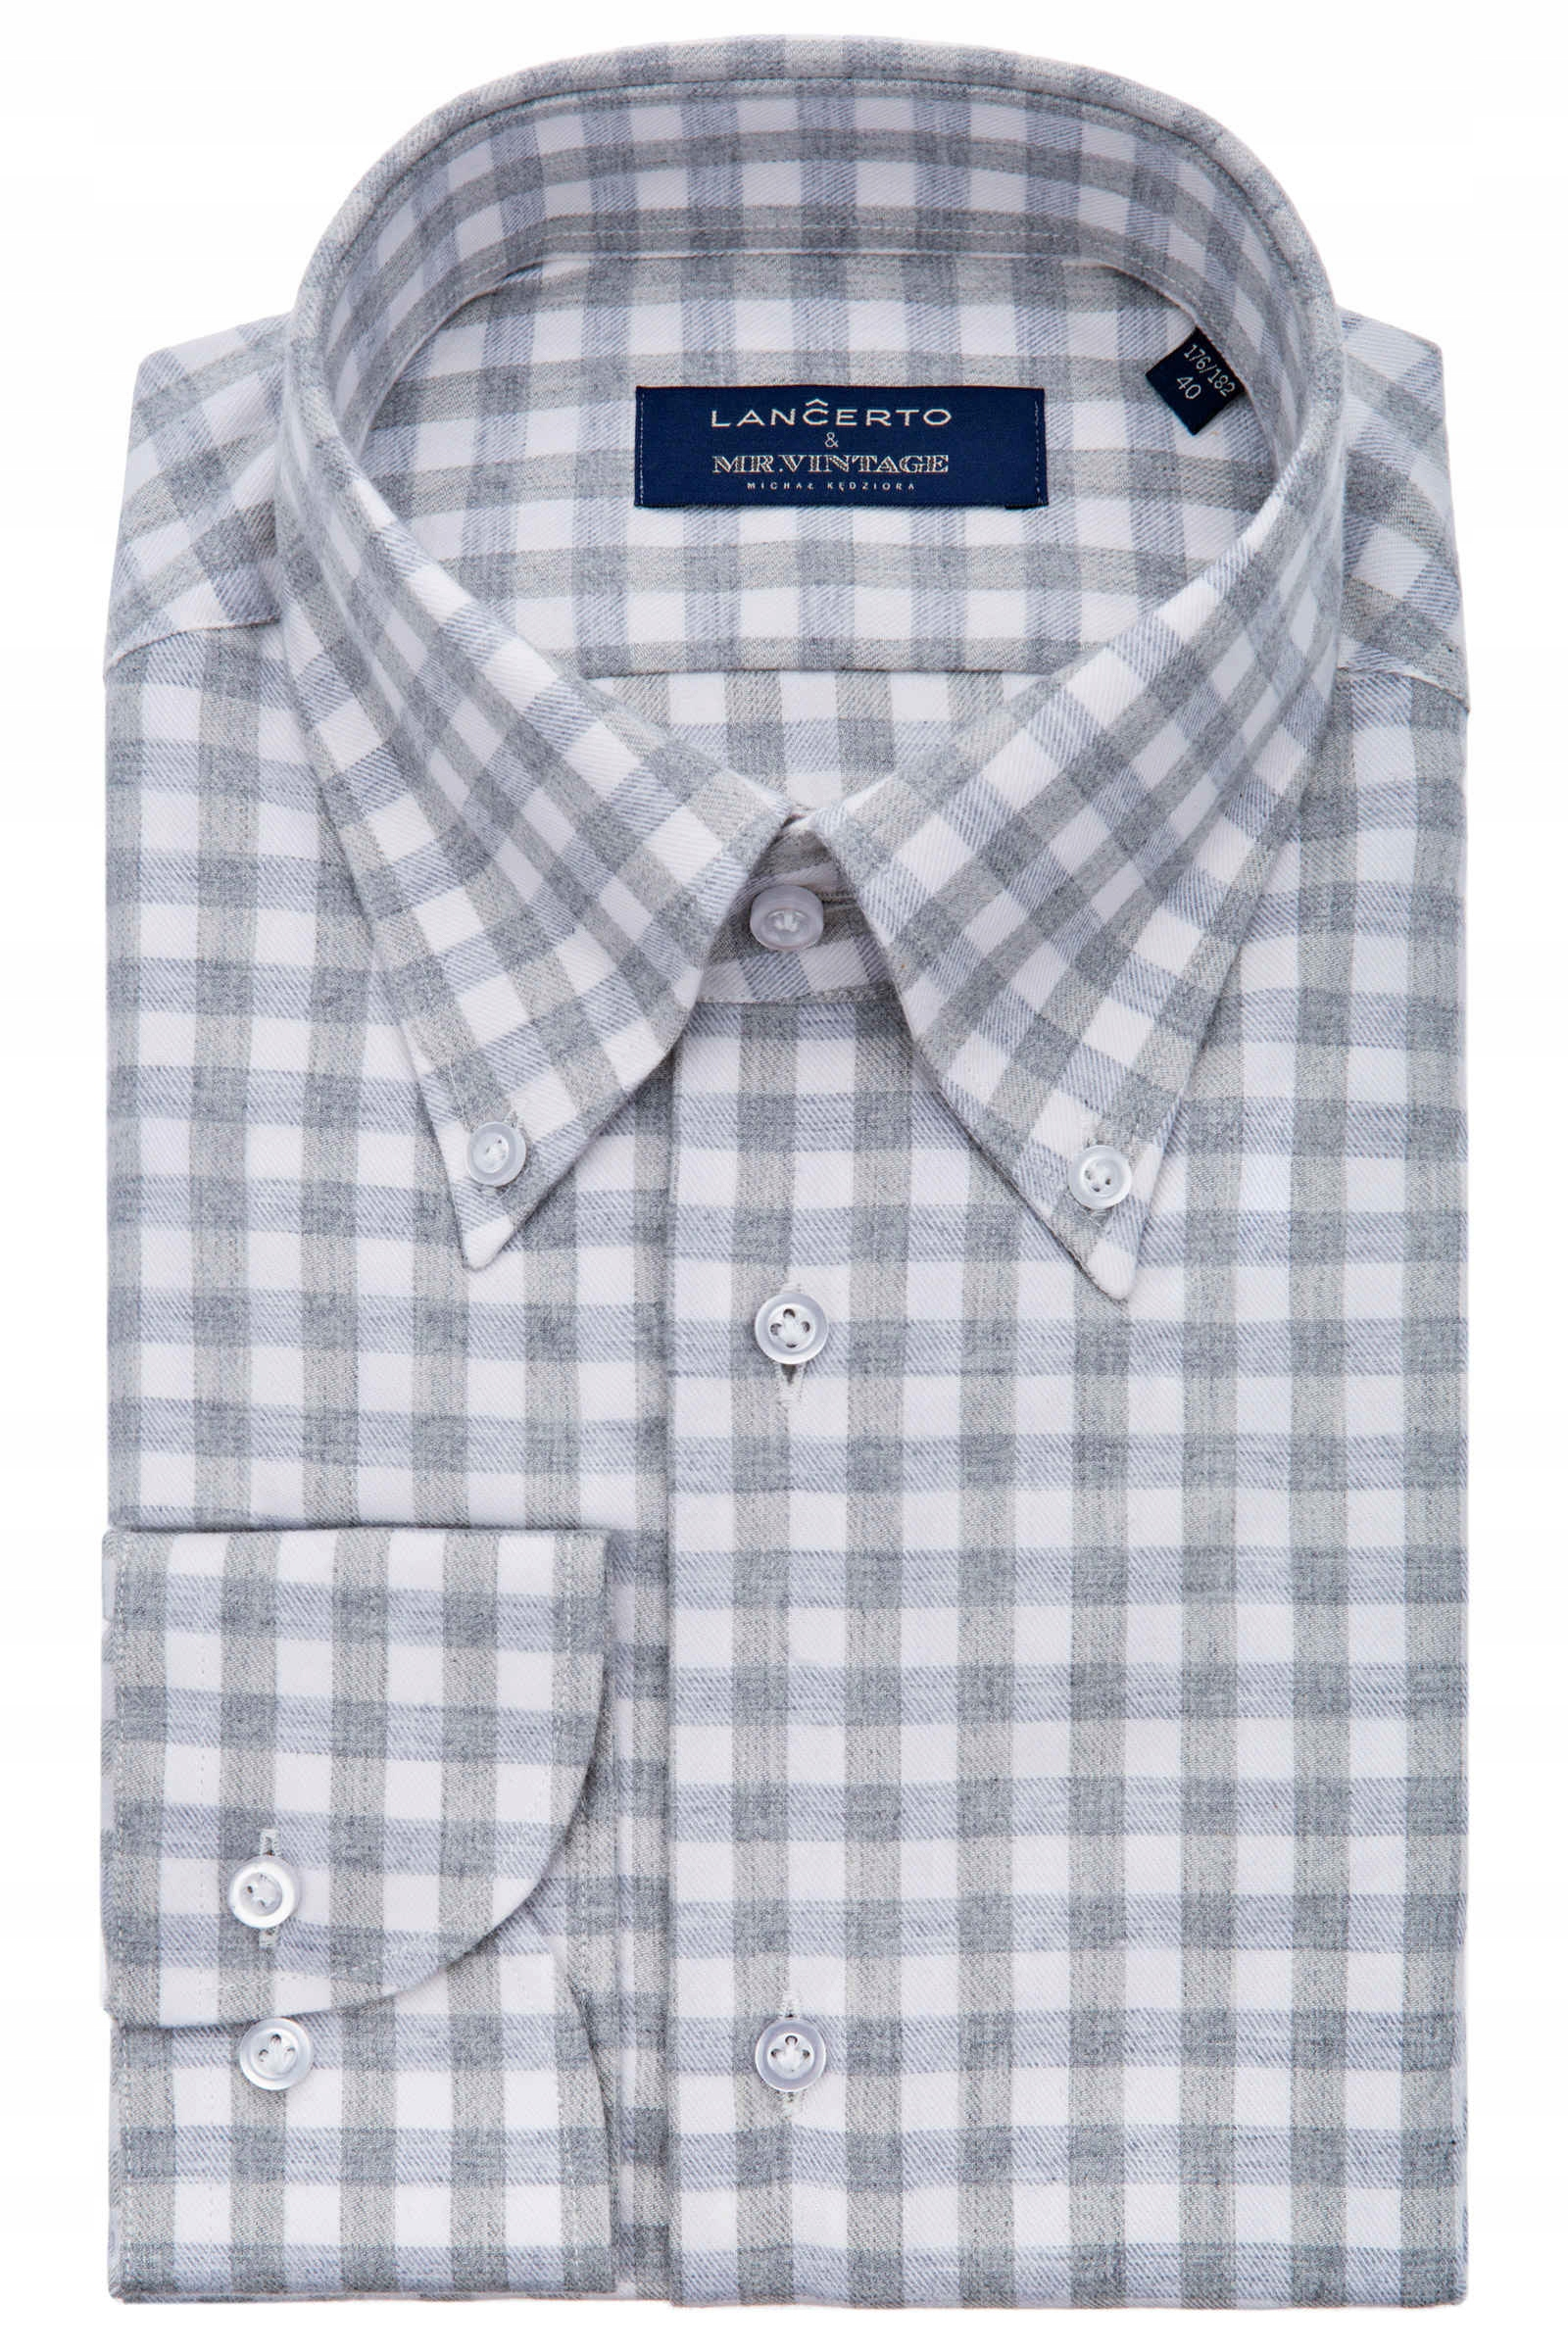 Lancerto tričko&Pán Vintage Medway 176/40